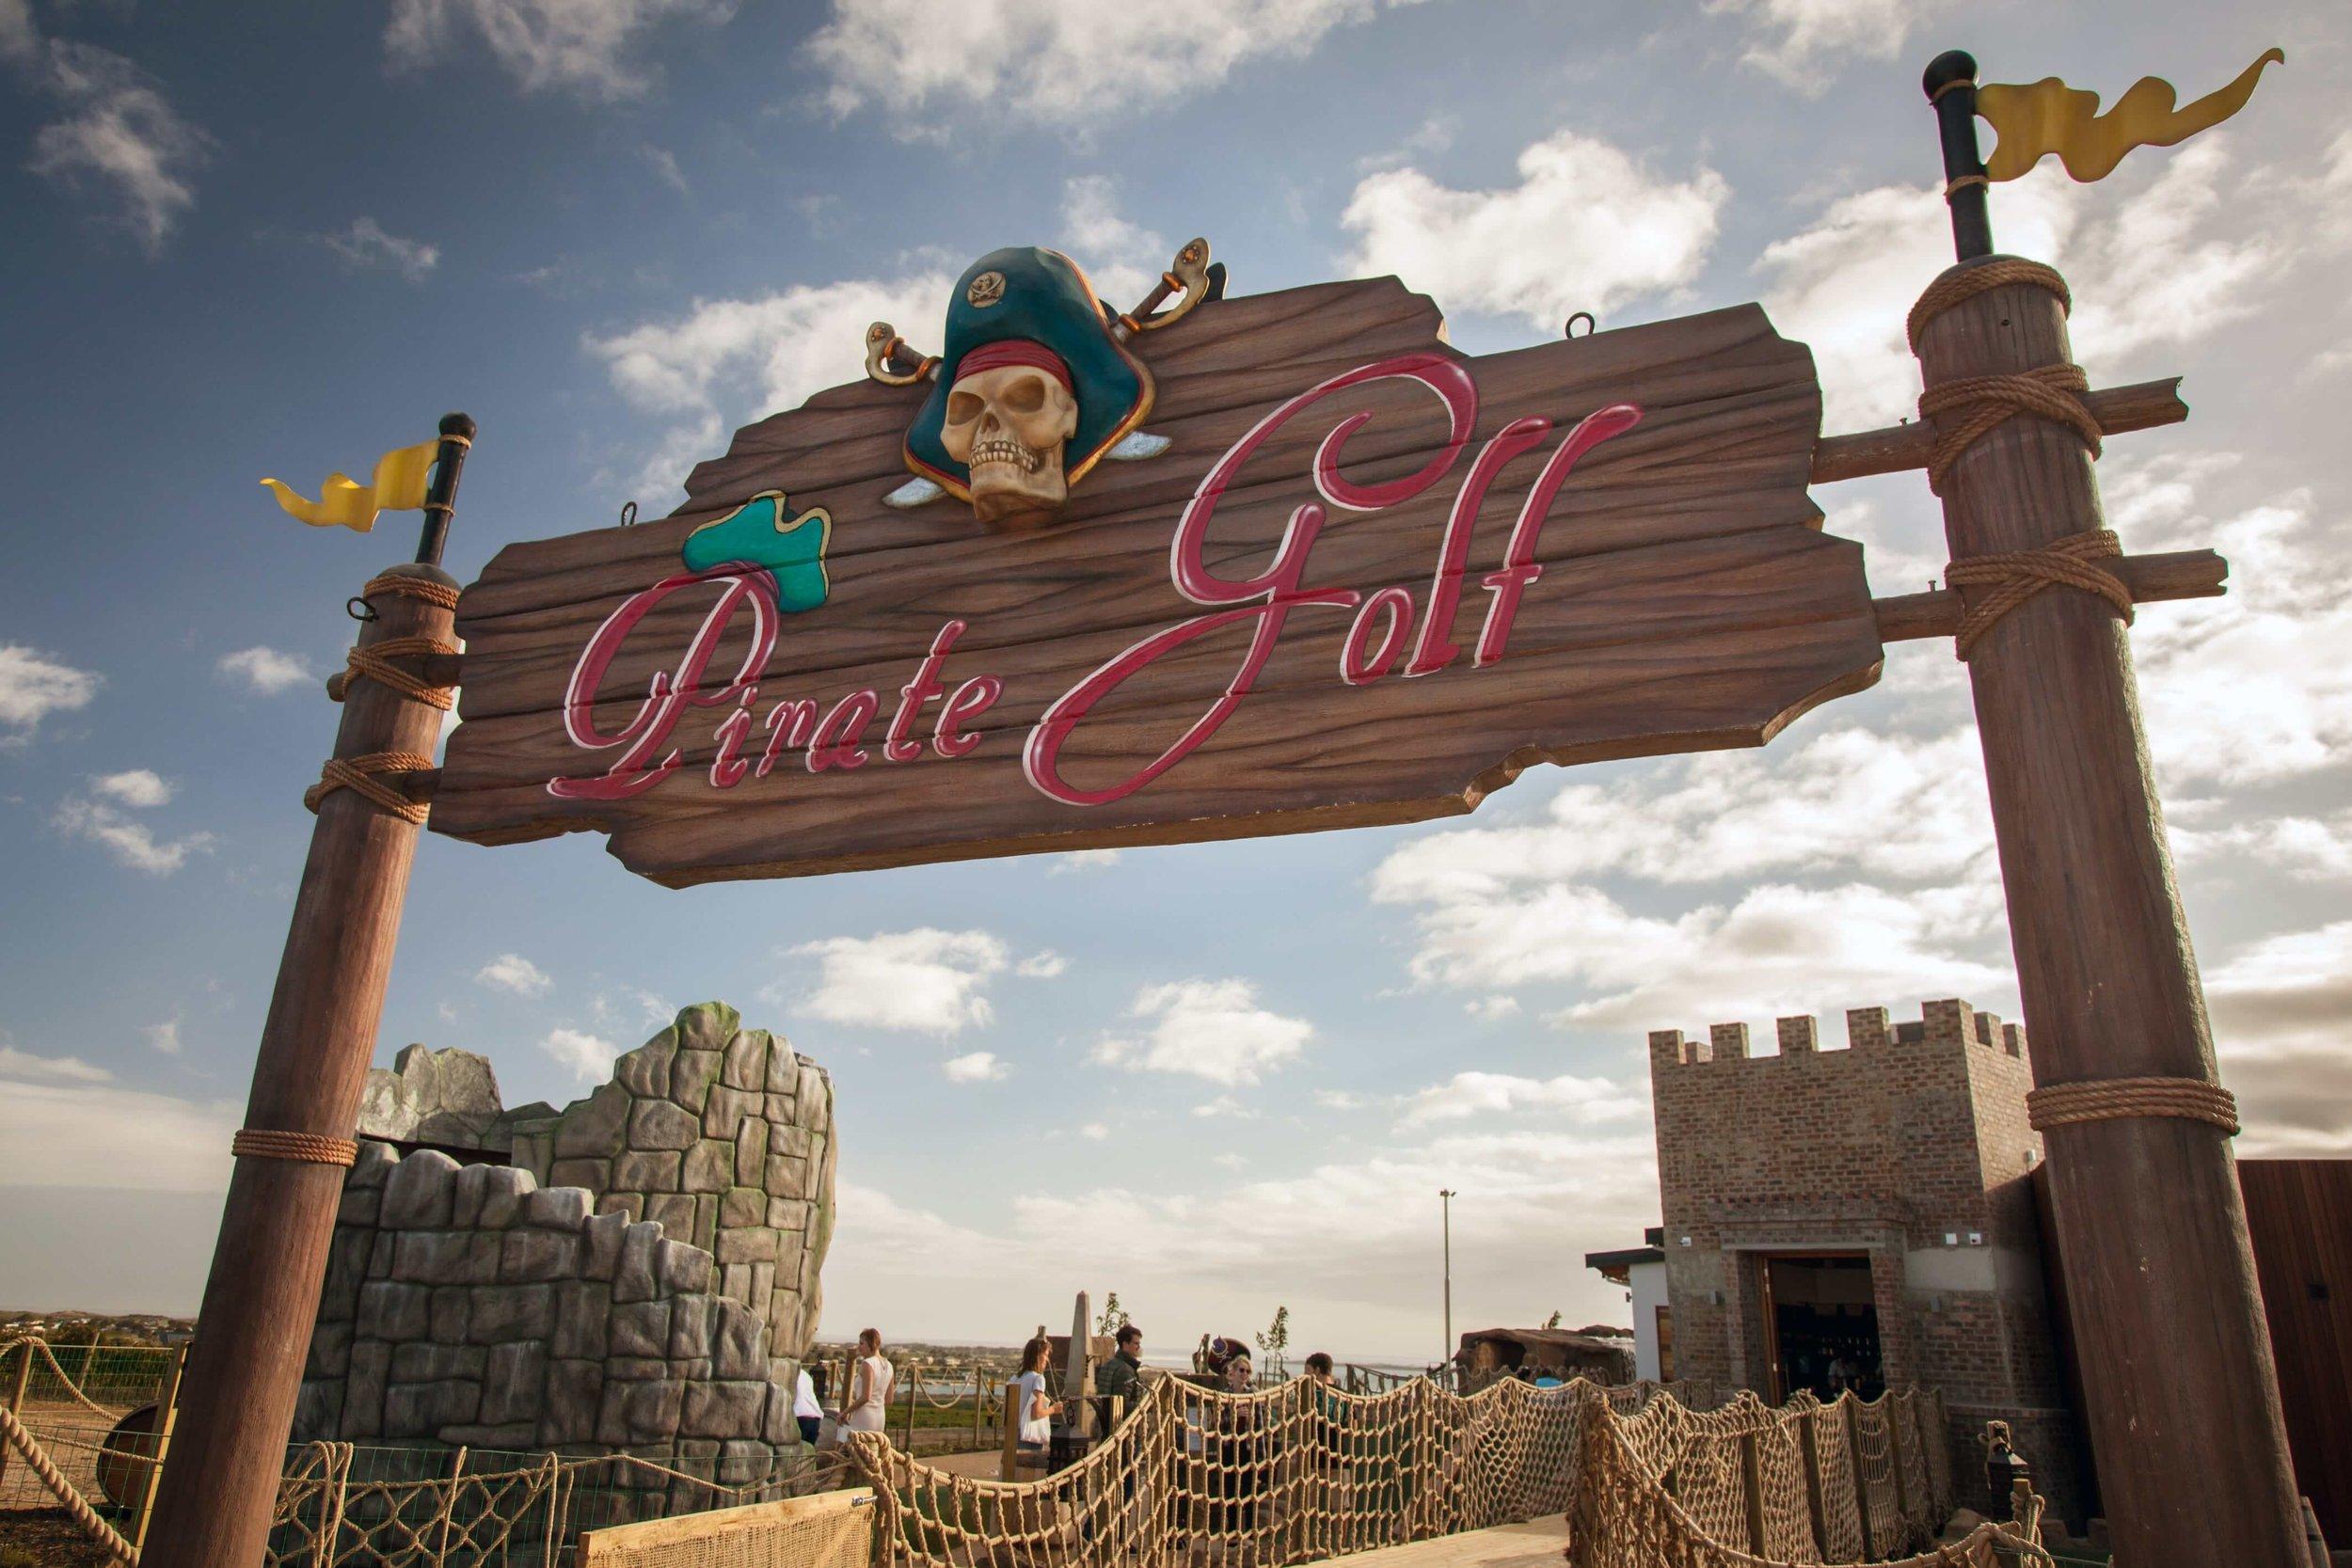 Pirate Golf 4-min.jpg